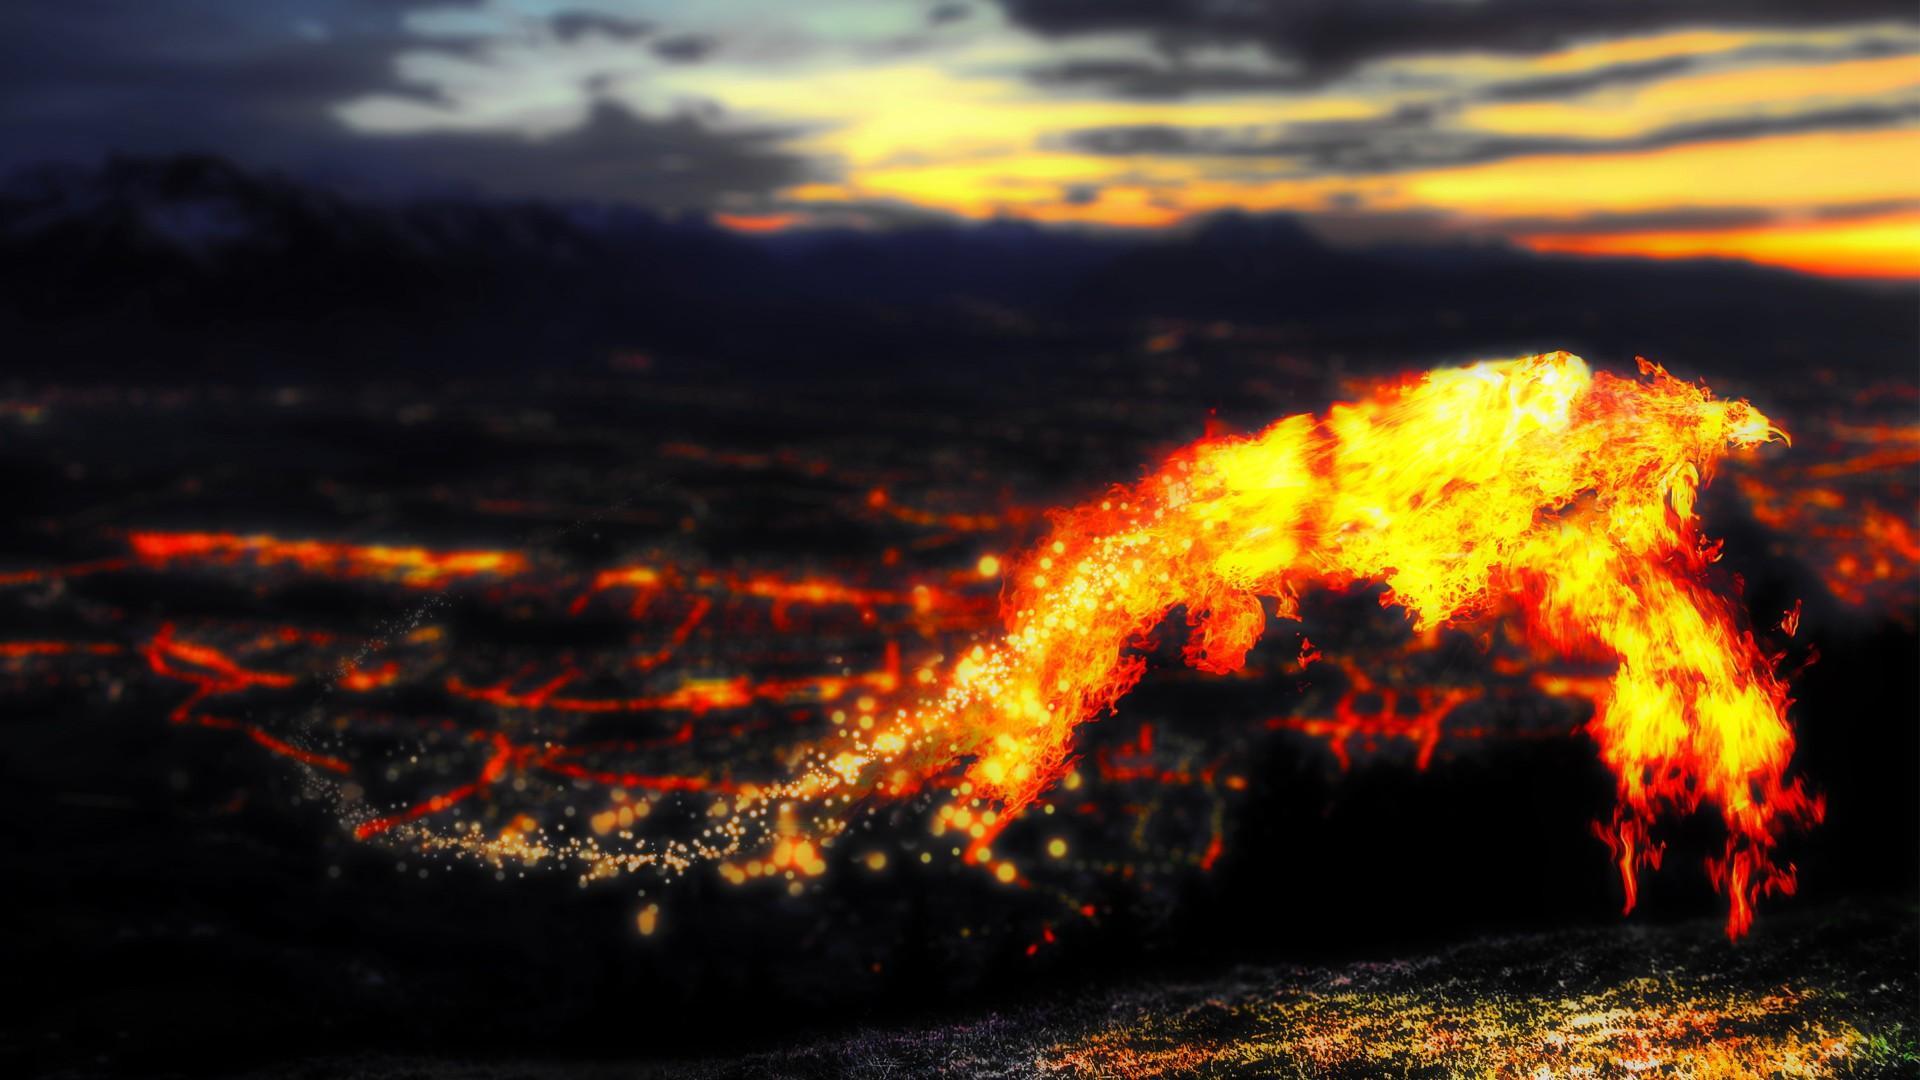 lava wallpaper hd free download